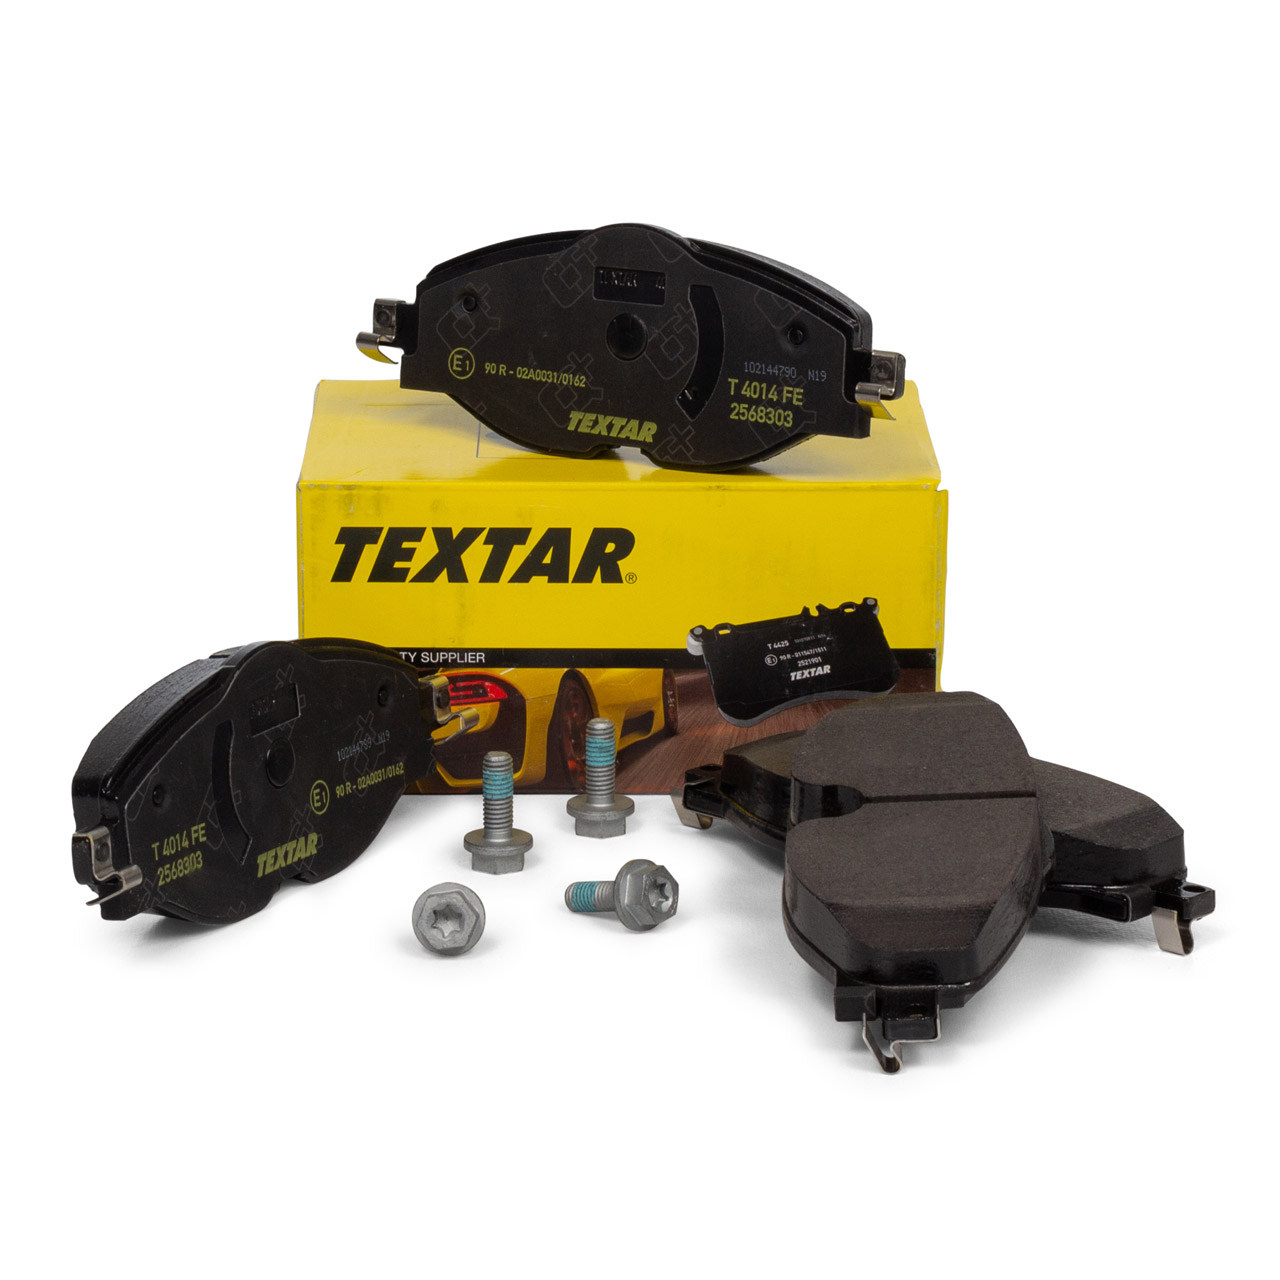 TEXTAR Bremsbeläge AUDI A1 (GBA) SKODA Karoq VW Golf 7 Passat Polo 2568303 vorne